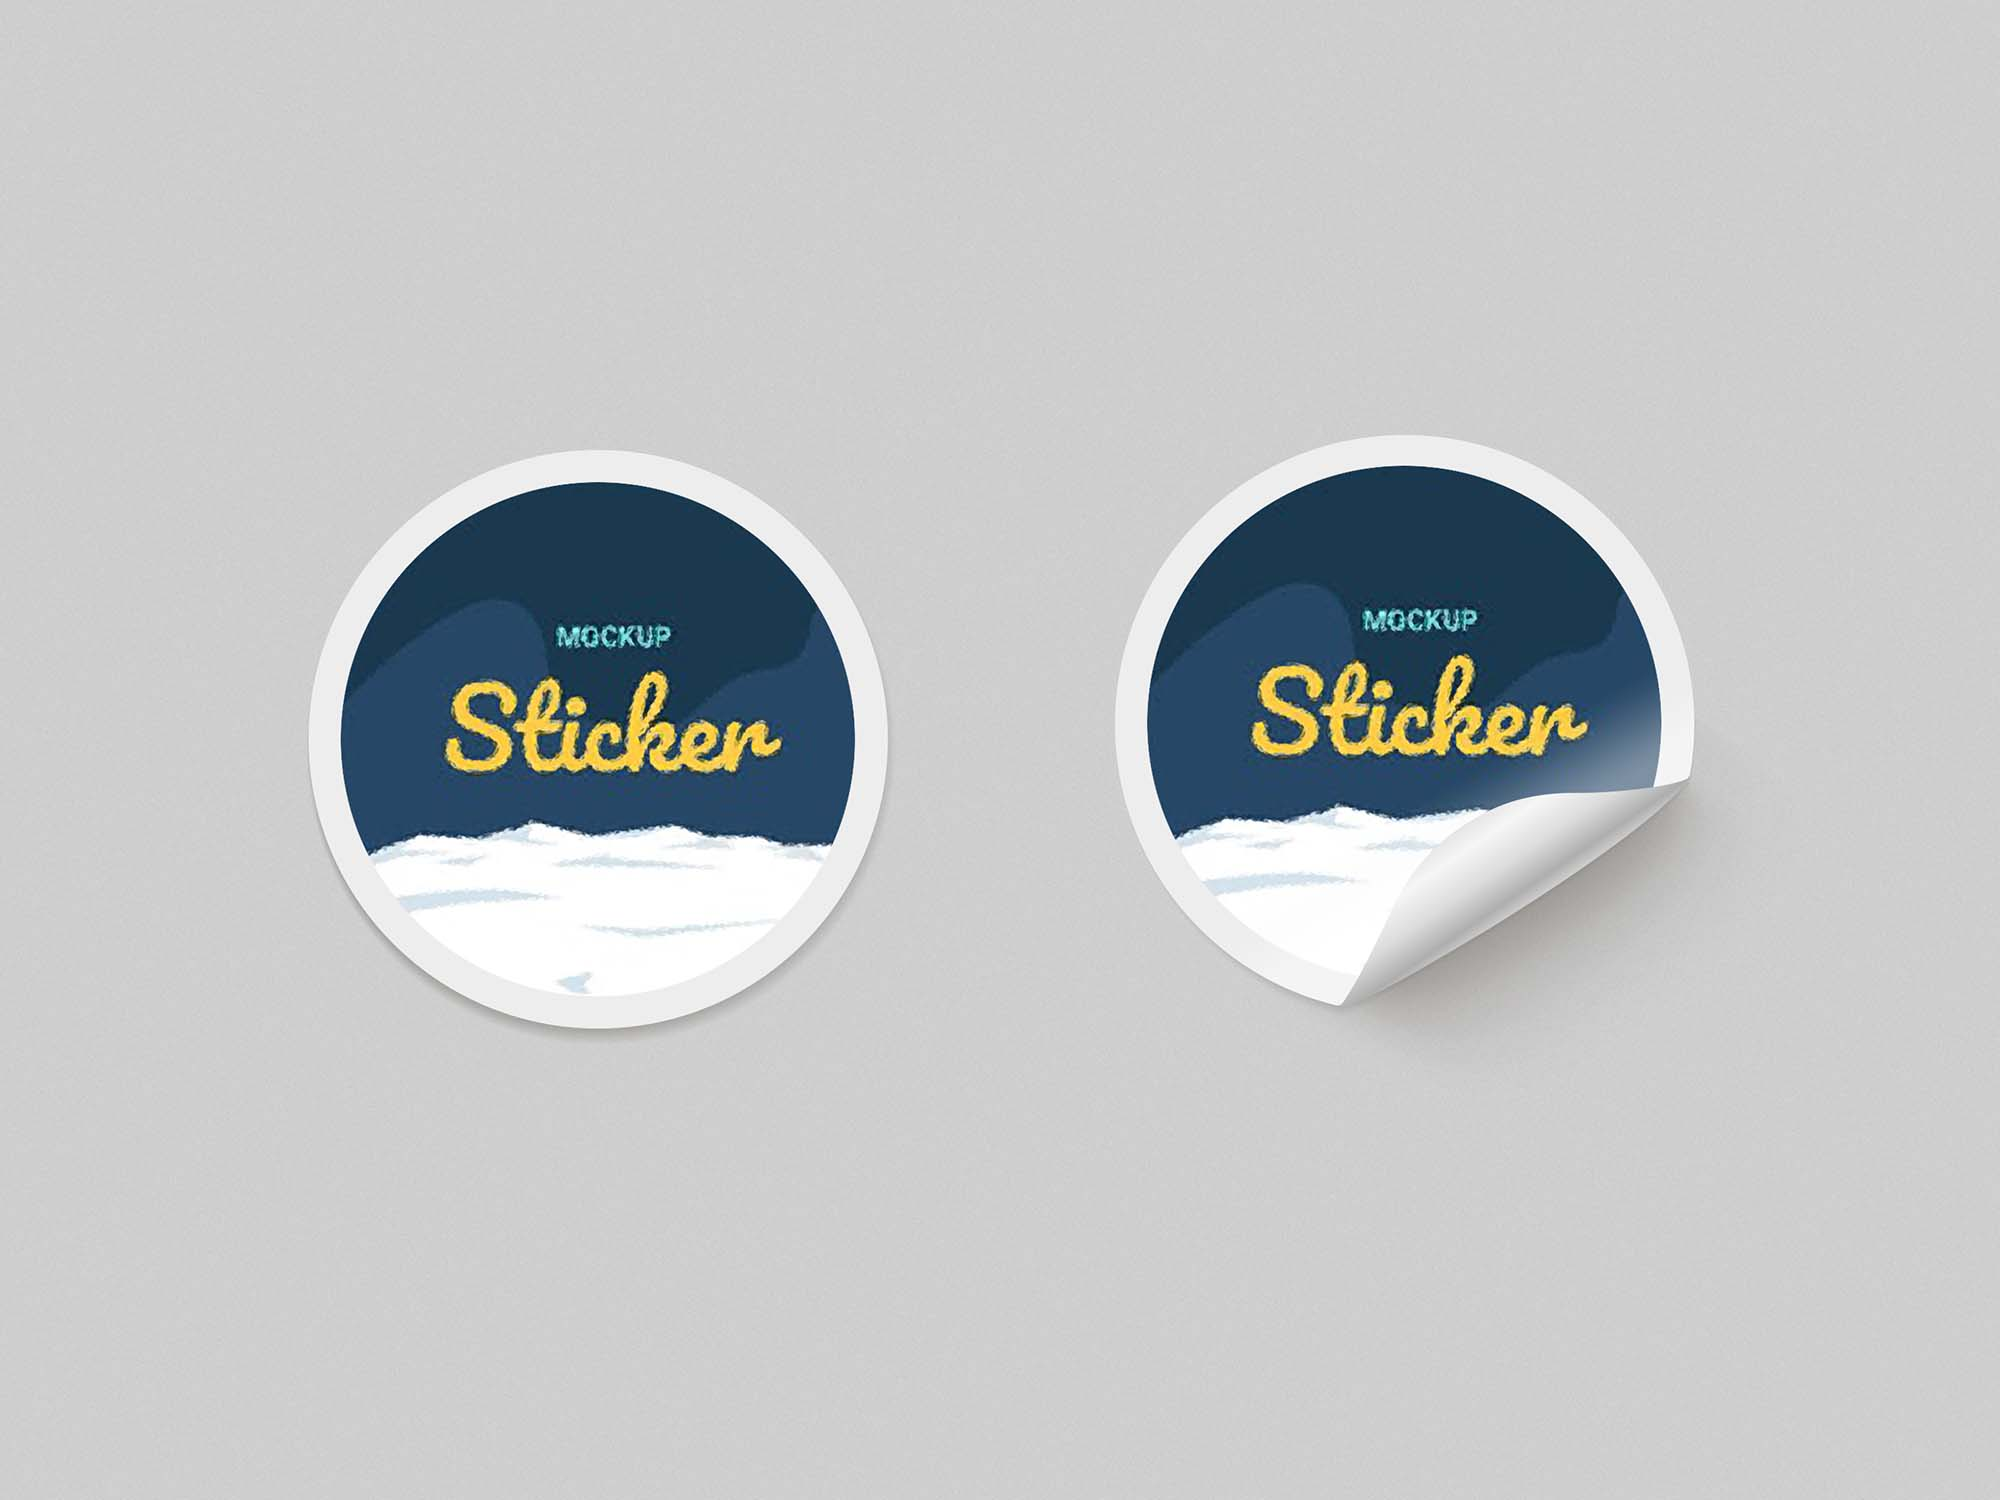 Round Paper Stickers Mockup